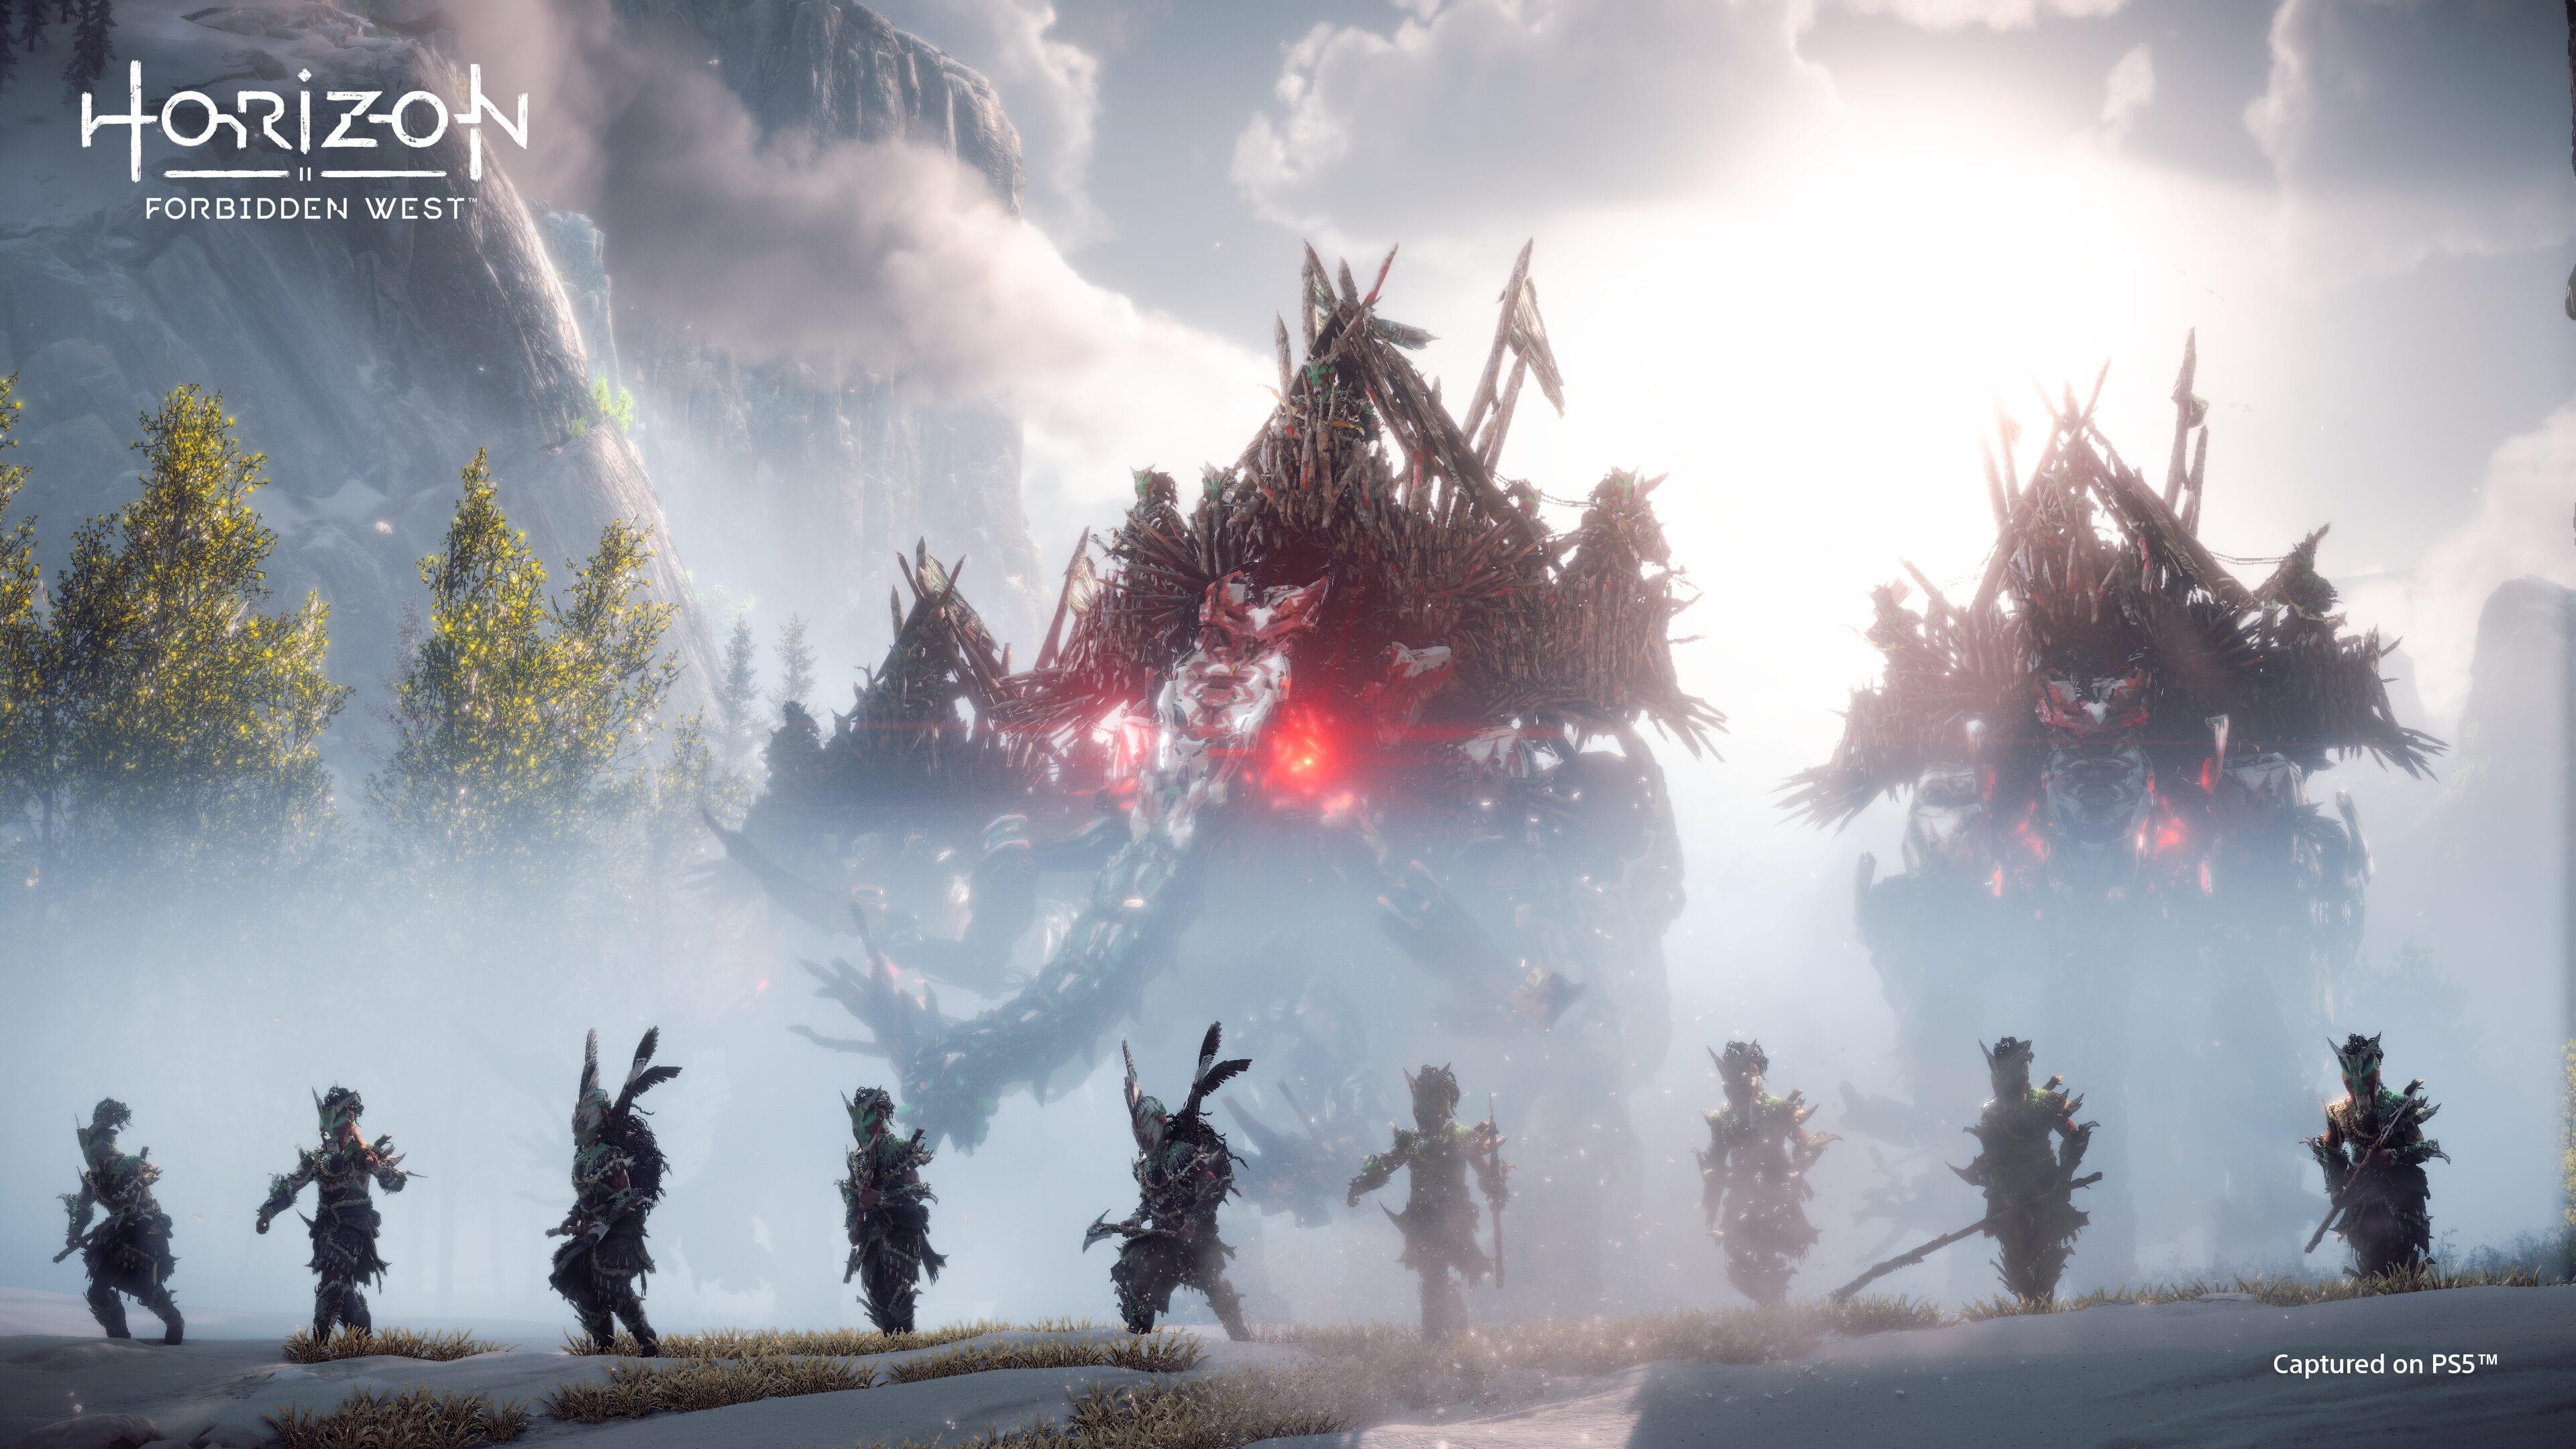 Horizon Zero Dawn Studio Is Seemingly Hiring For An MMORPG